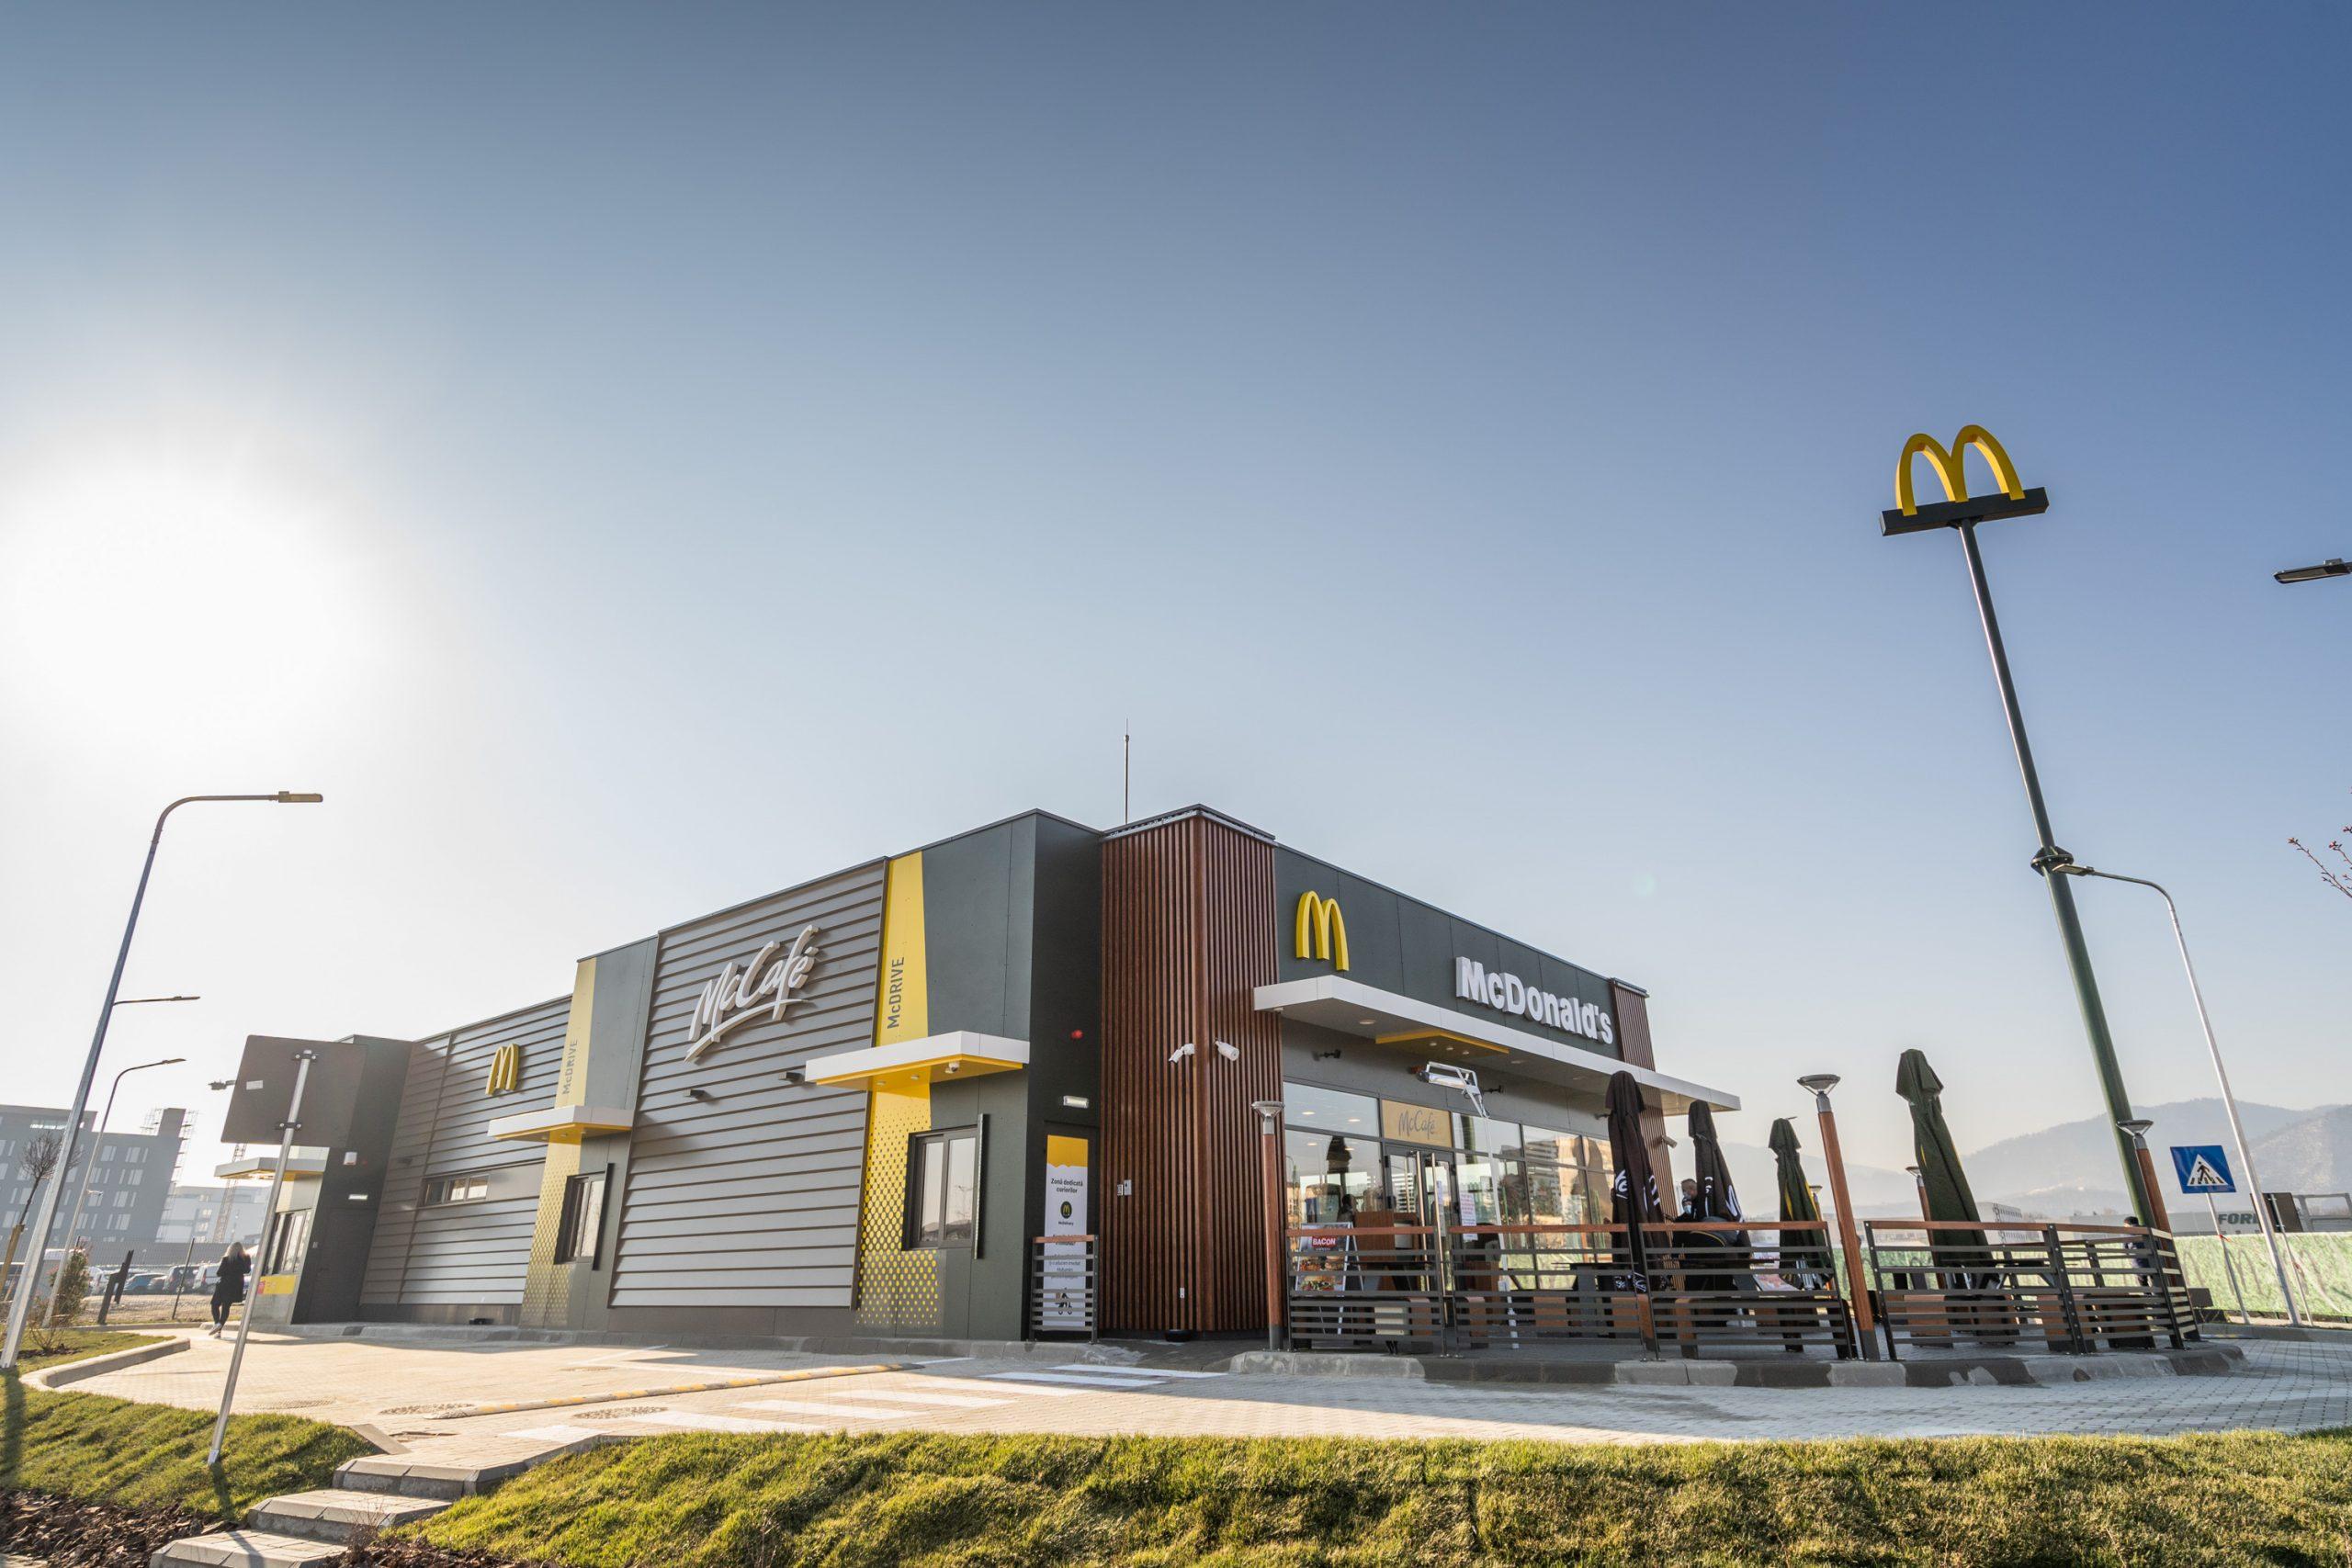 McDonald's Coresi_Bv_2